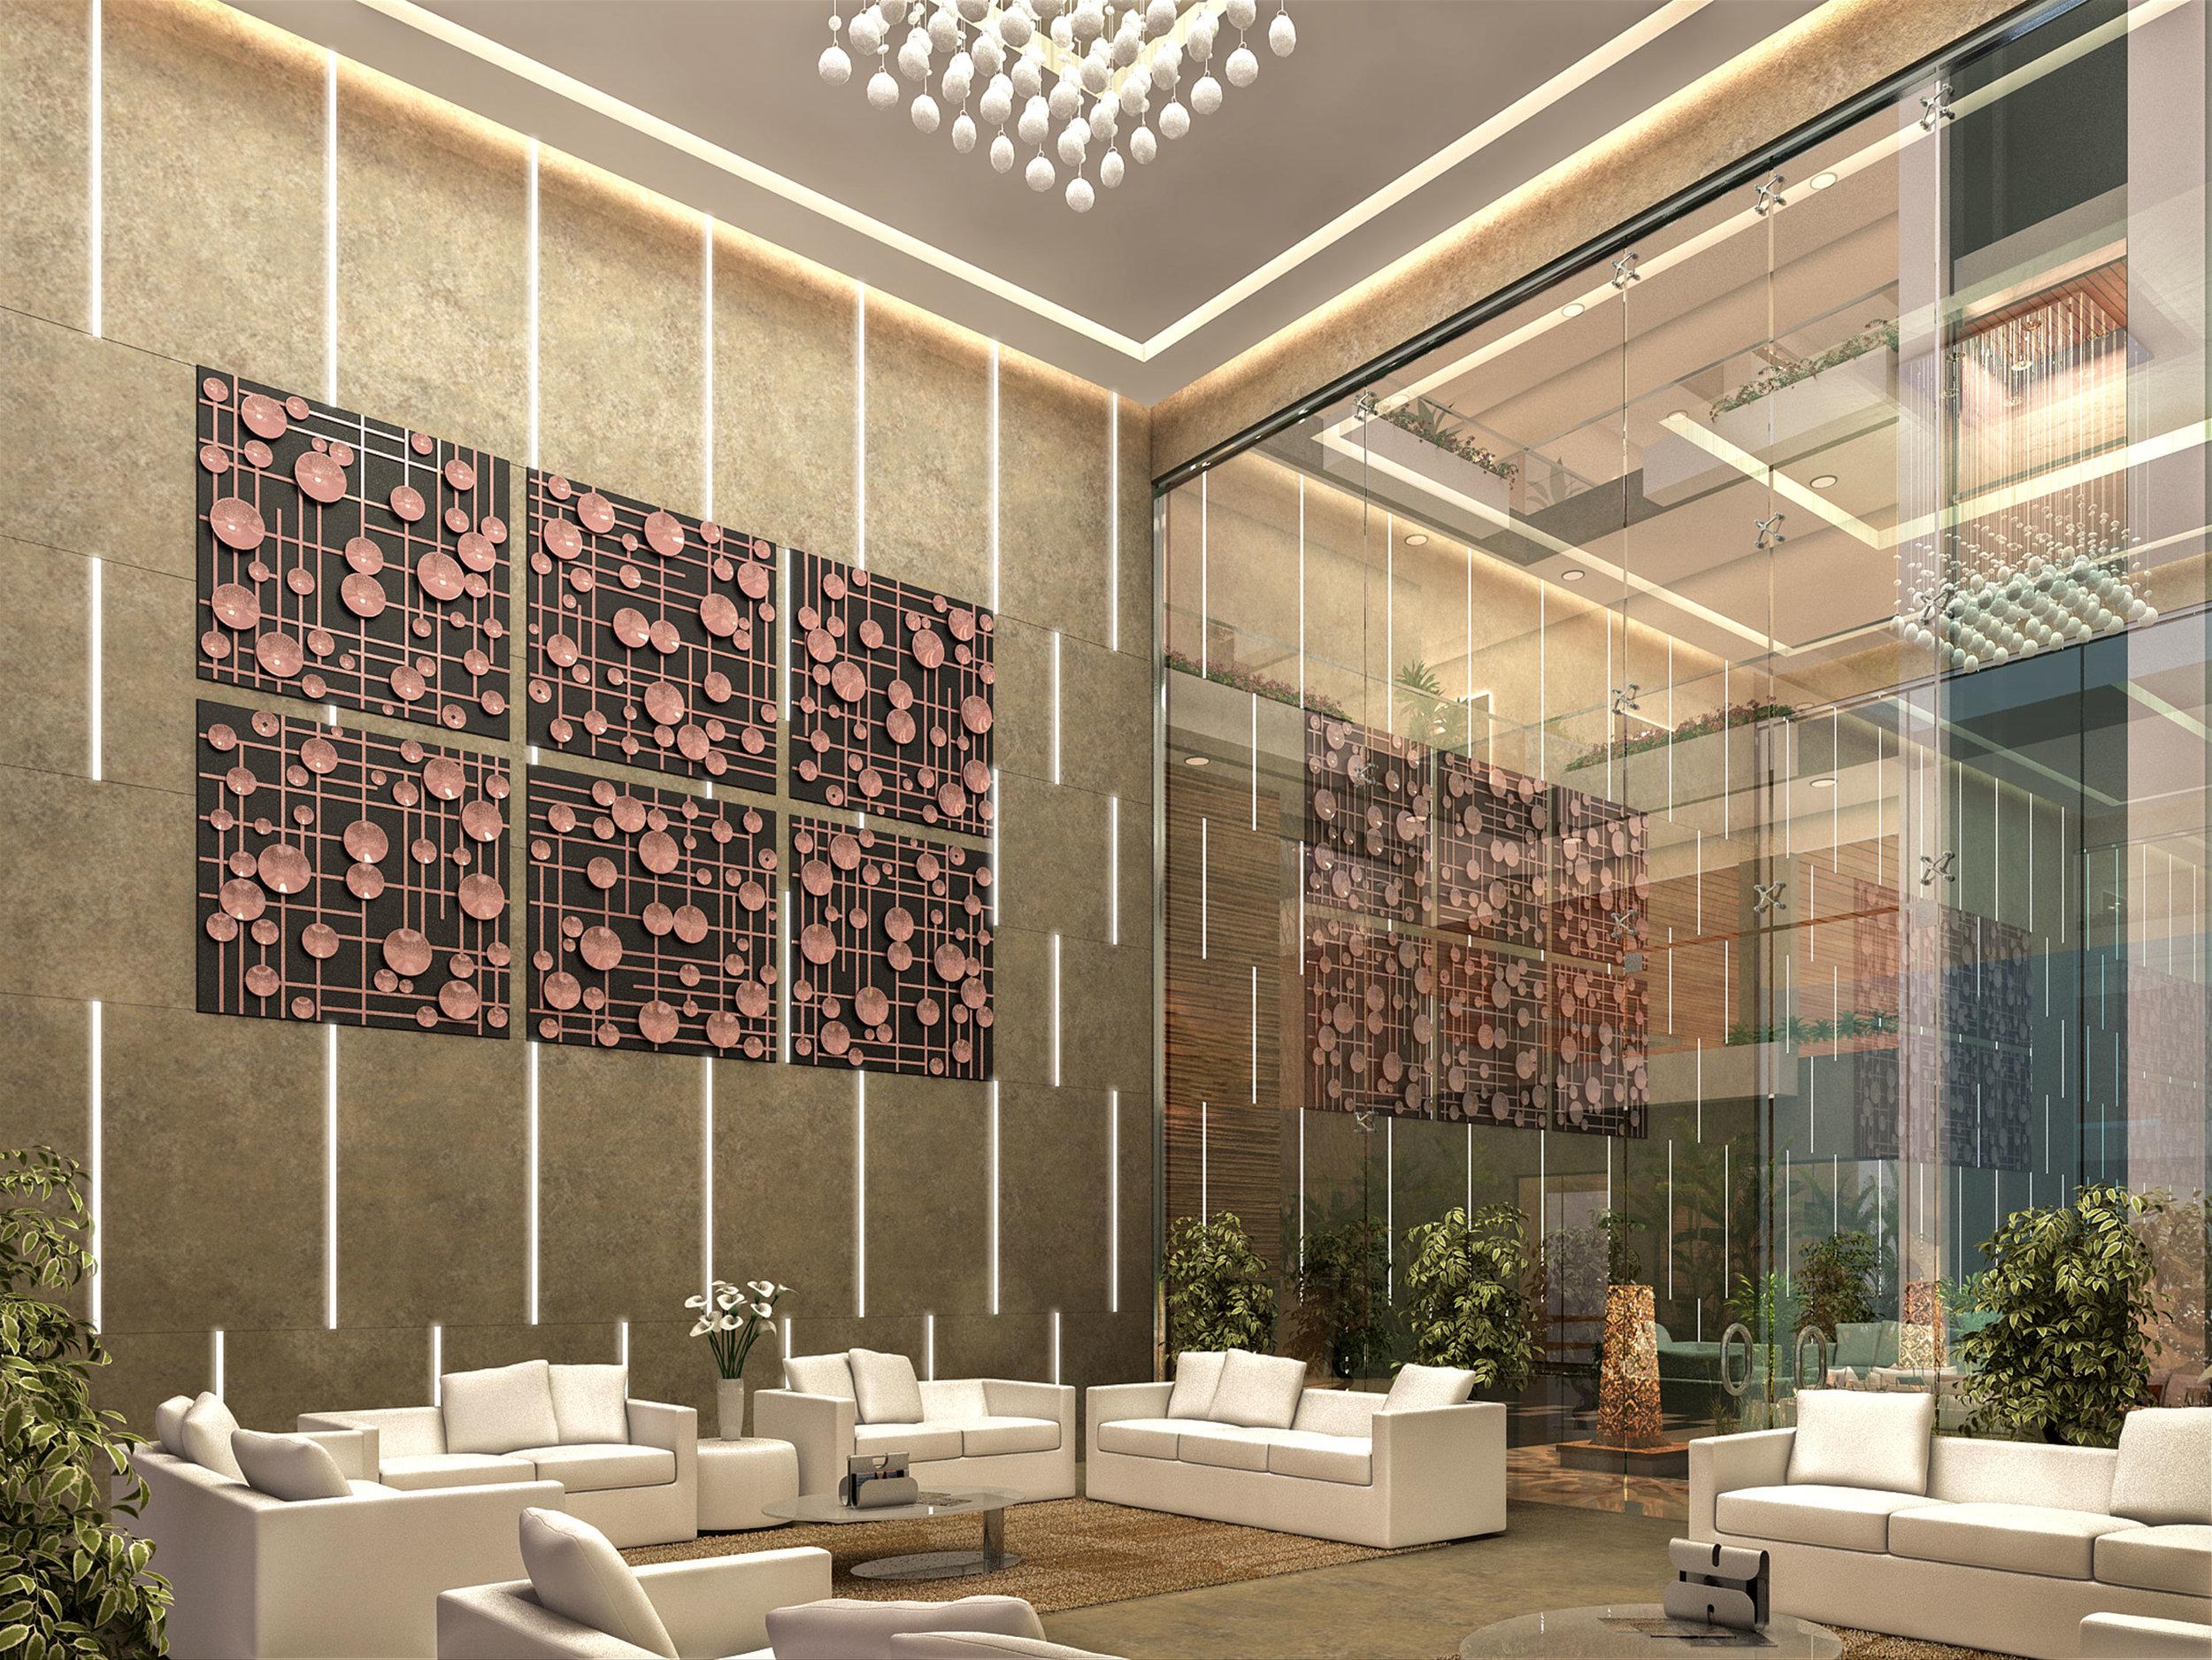 Silver-Decks-Lobby-Render.jpg